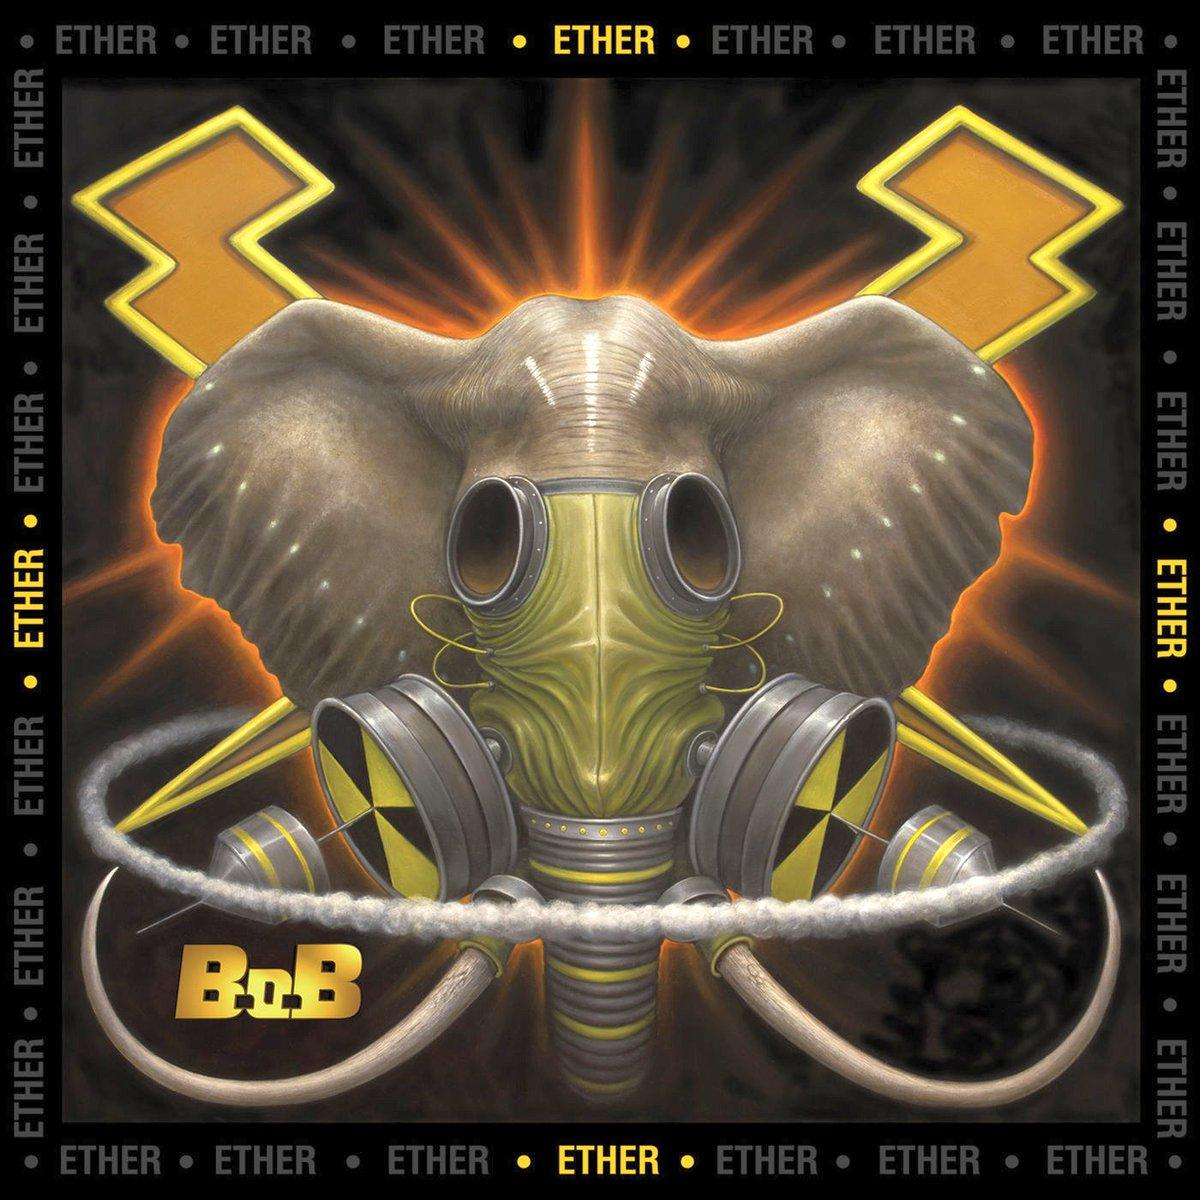 B.o.B - 4 Lit Lyrics ft. T.I. & Ty Dolla Sign 2